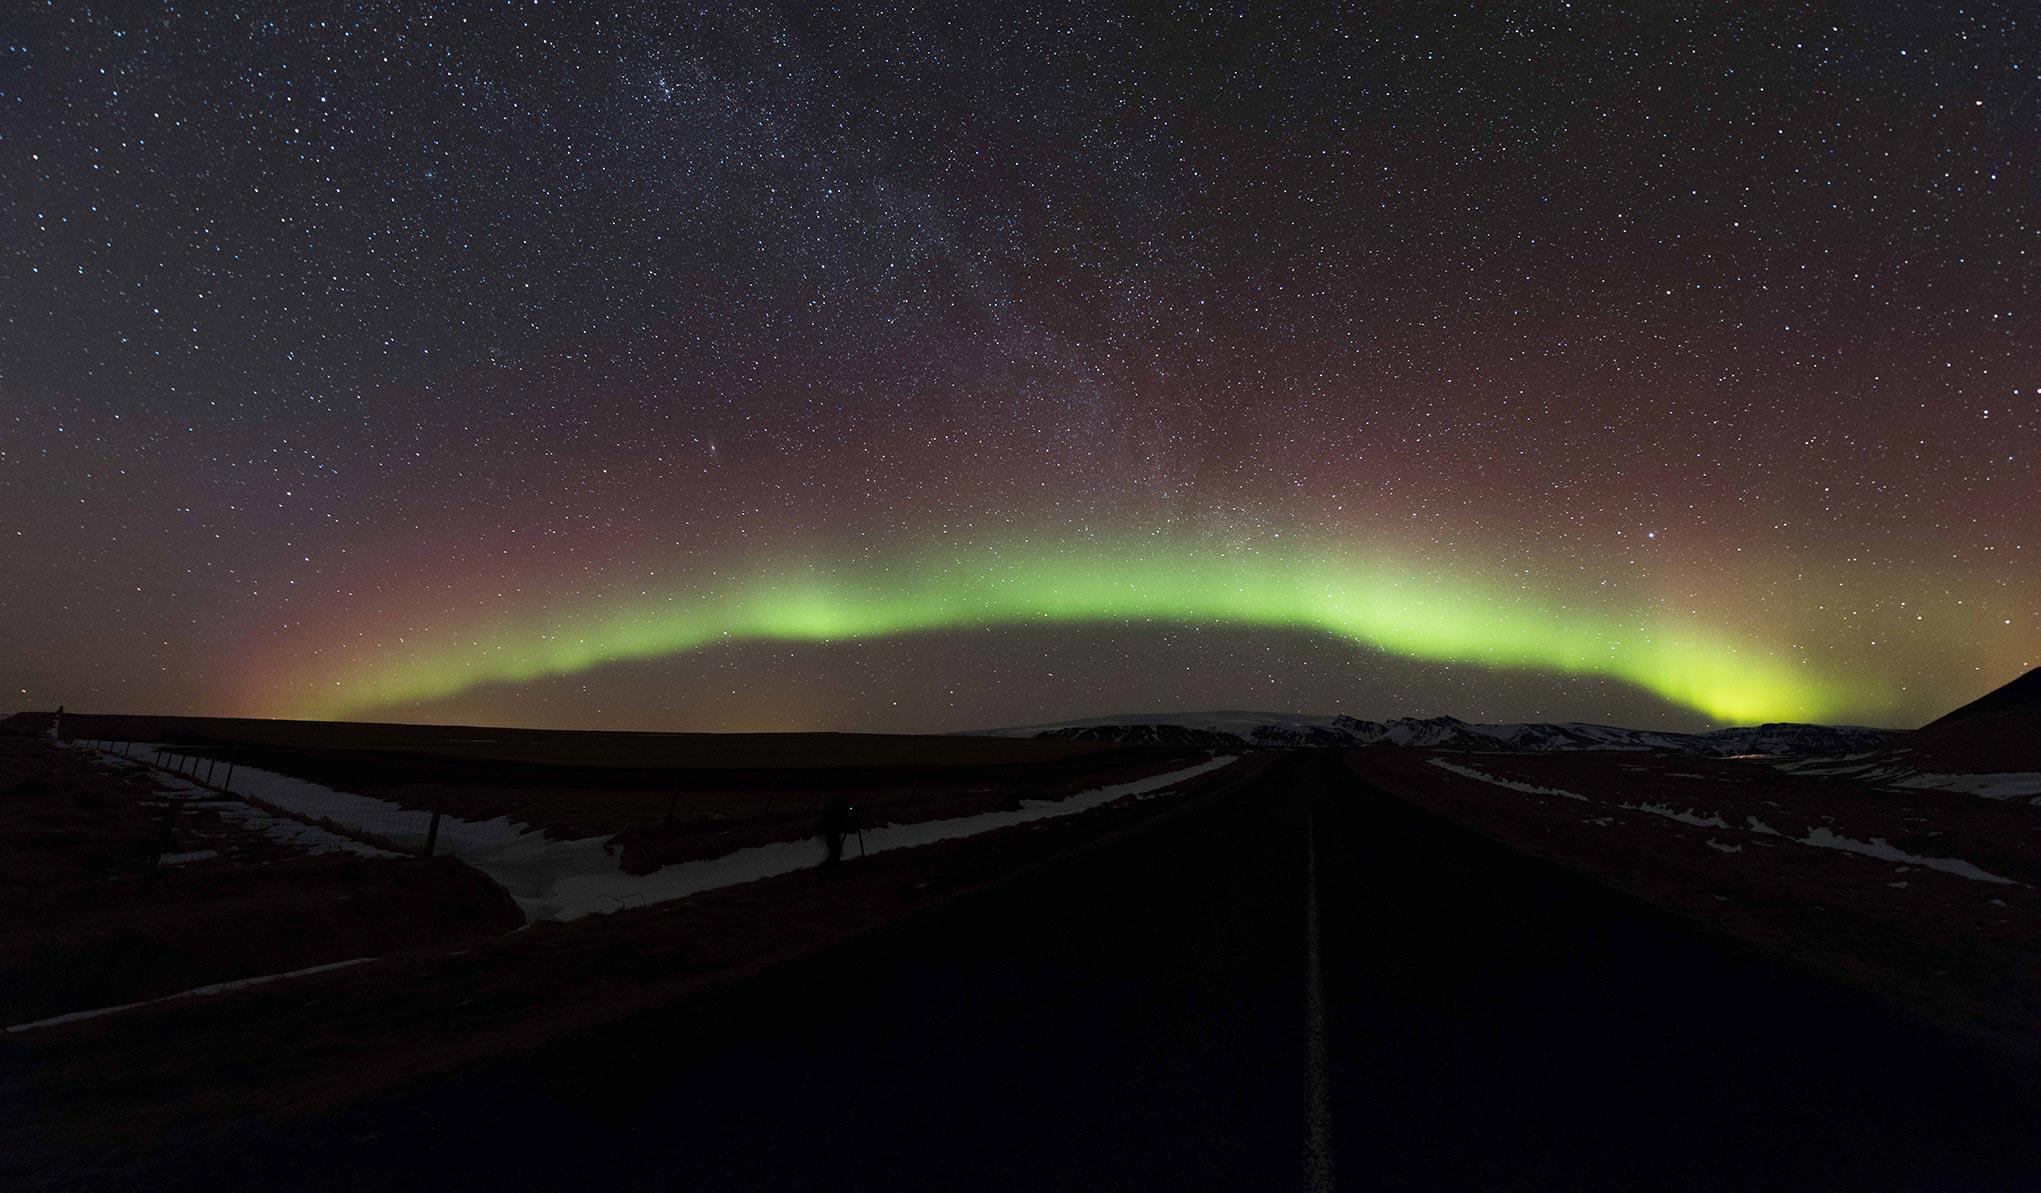 Northern lights over Mýrdalsjökull ice cap in March 2018. Credit: Sævar Helgi Bragason